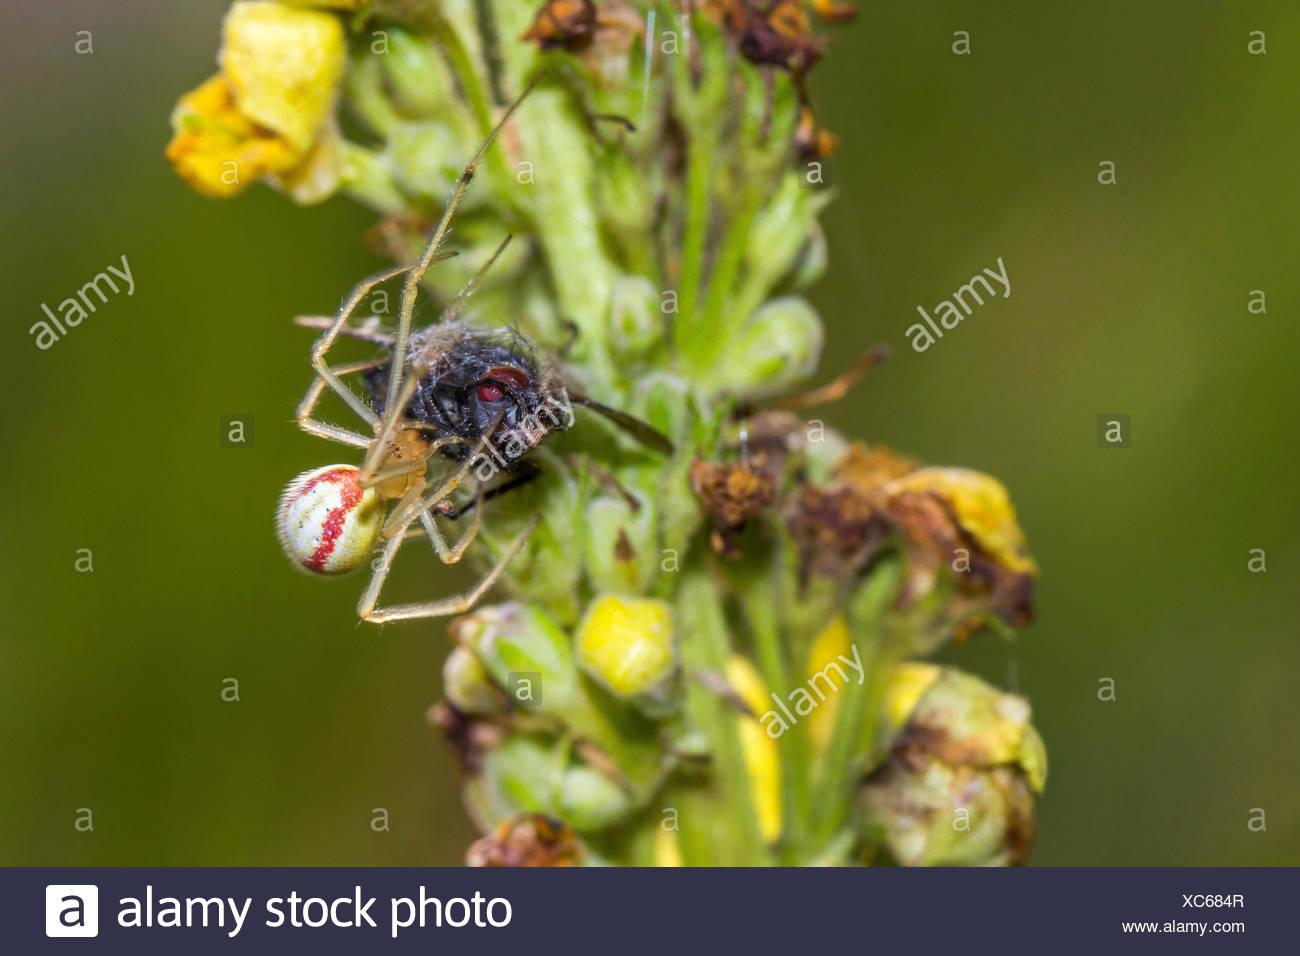 Rotweiss-Spinne, Rotweissspinne, Rotgestreifte Kugelspinne (Enoplognatha ovata, Enoplognatha lineata, Theridion redimitum), mit  - Stock Image